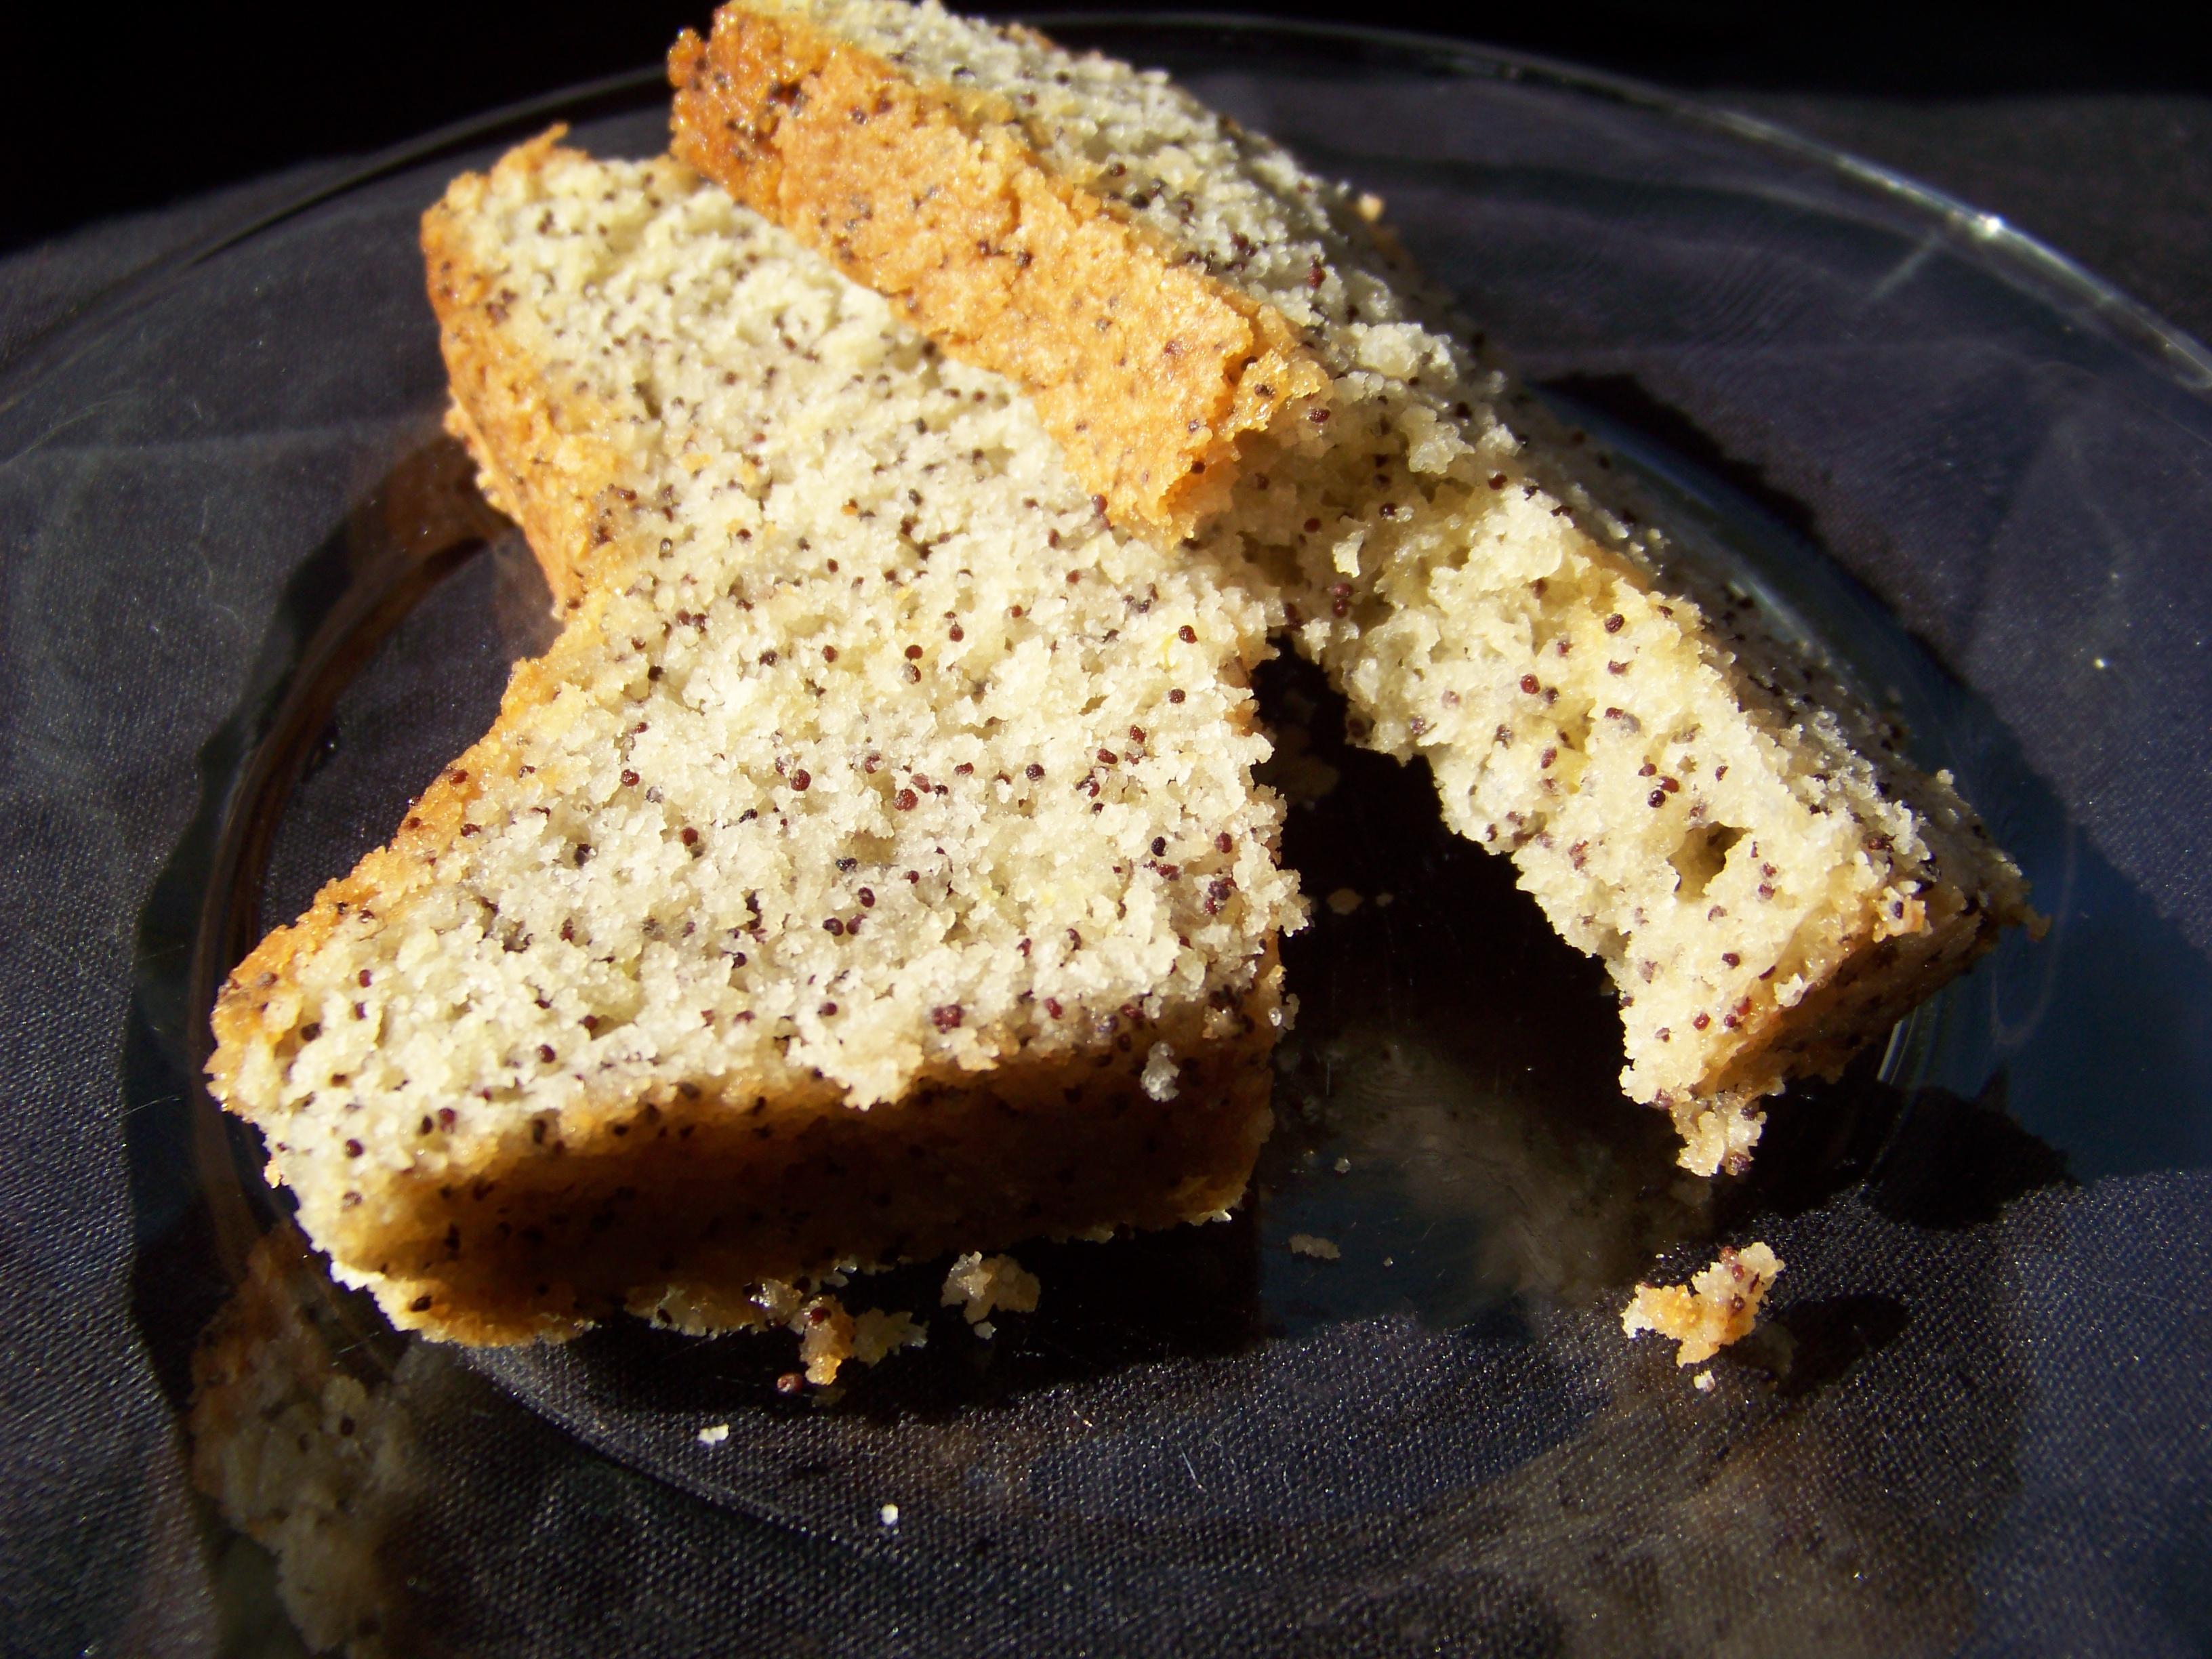 Recipe For Lemon Poppy Seed Bread Using Cake Mix